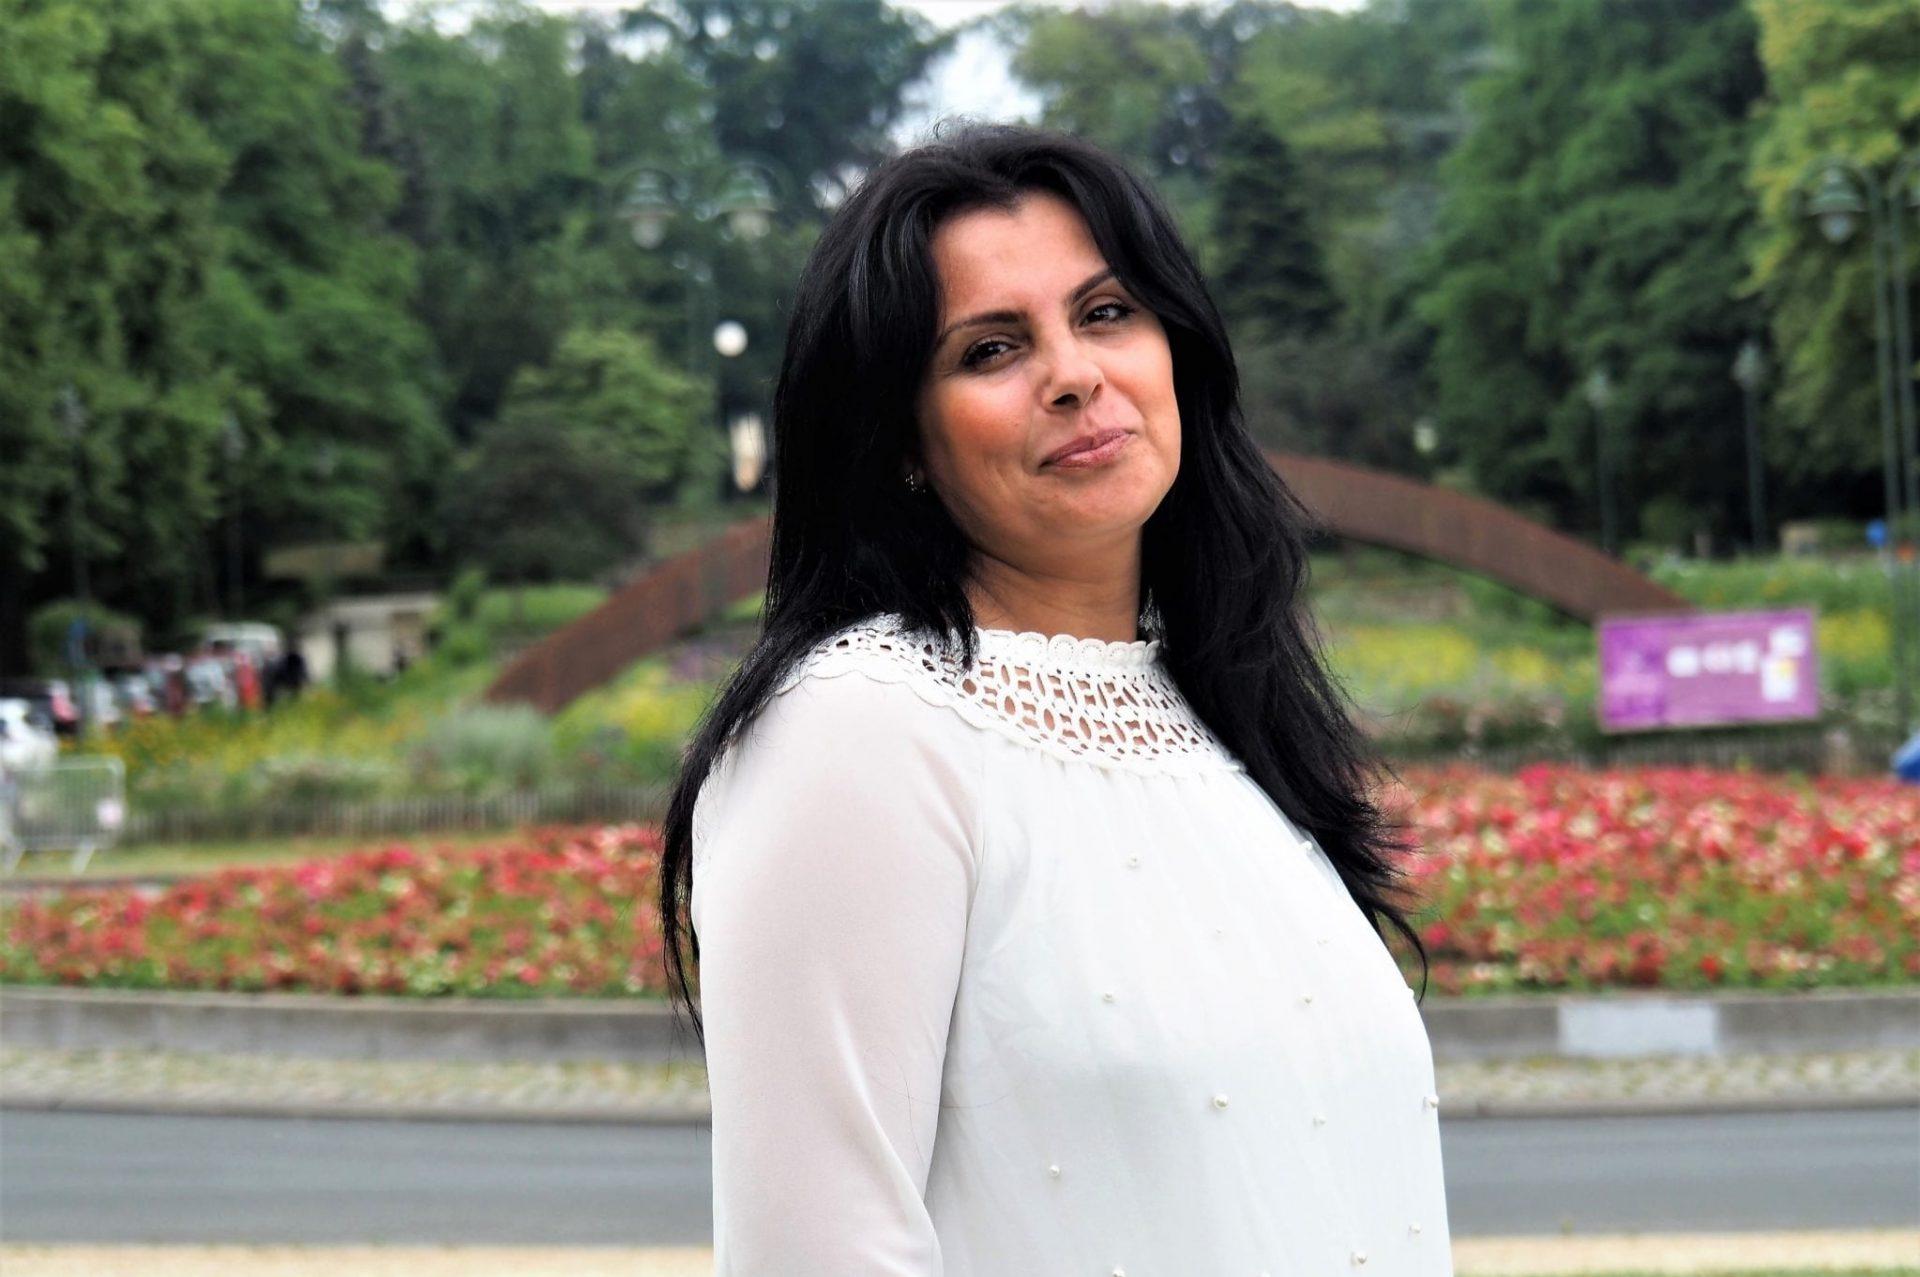 Samira BOUAID